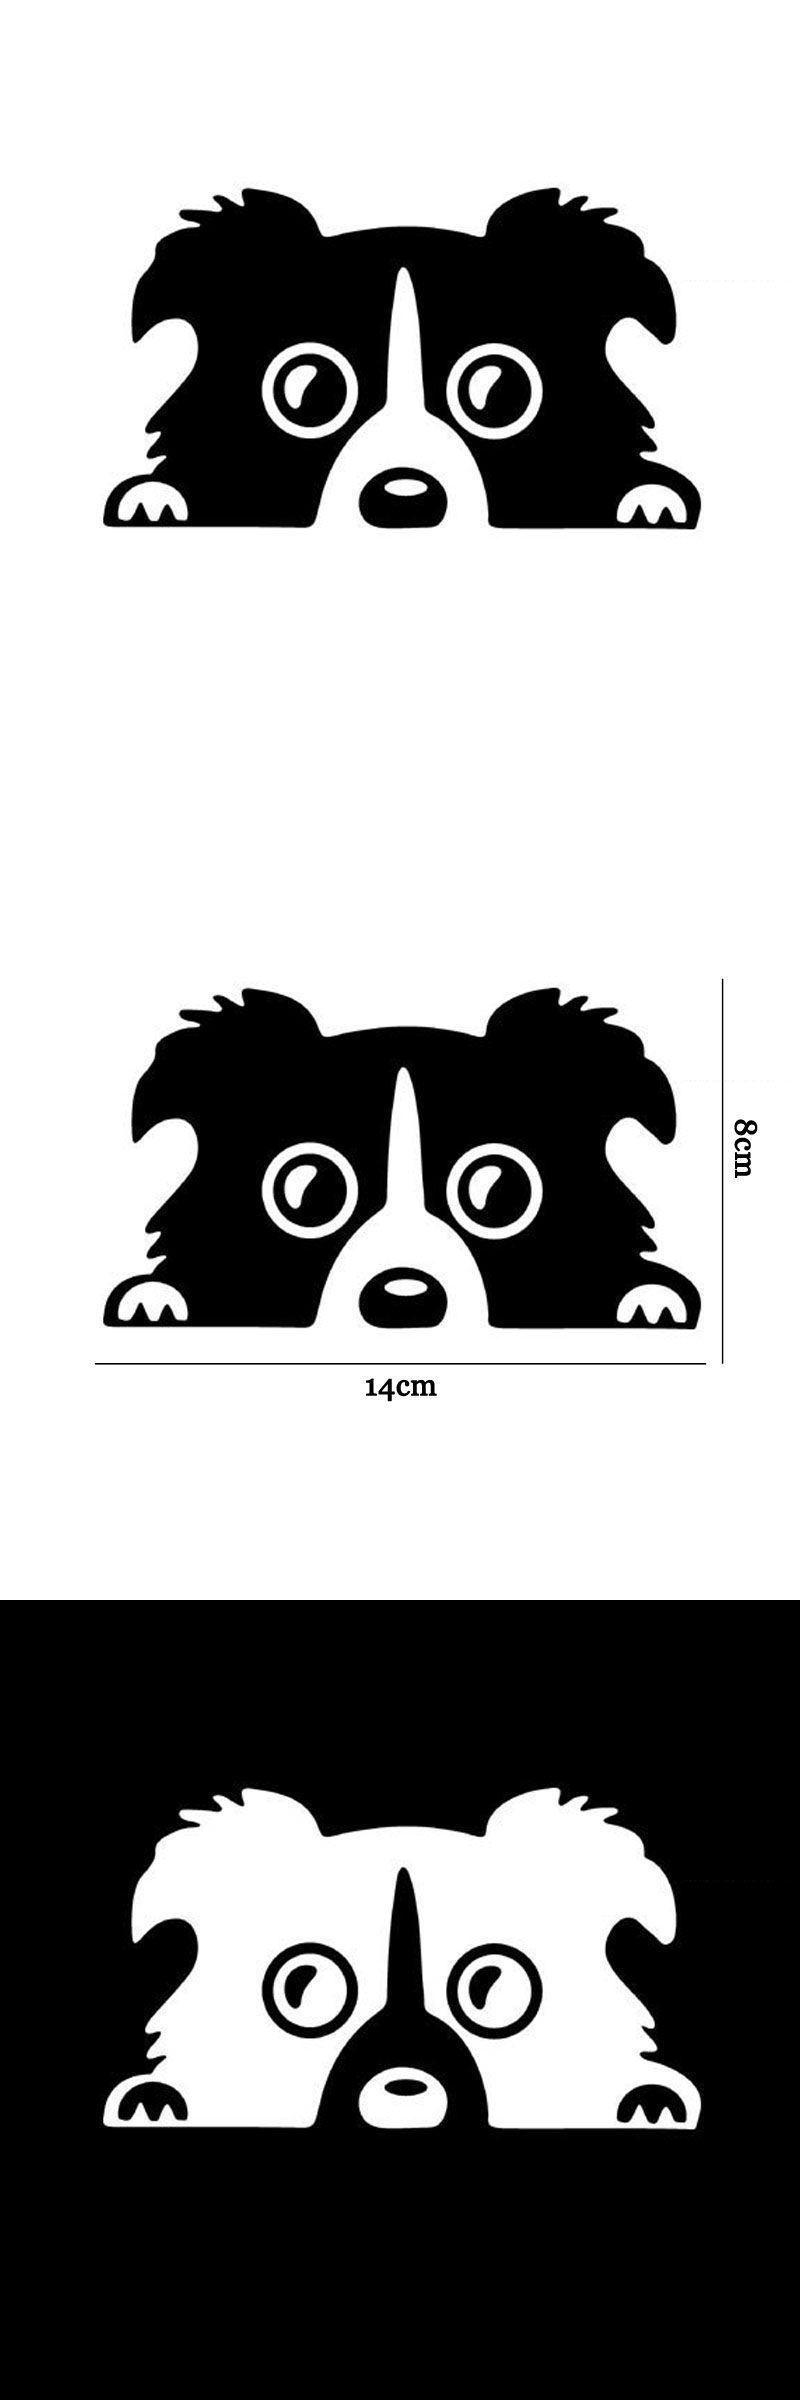 14 8cm Border Collie Dog Personality Reflective Glass Rear Pet Car Sticker Black Silver Ct 505 Dogtattoobordercollie Dog Tattoos Dog Personality Border Collie [ 2400 x 800 Pixel ]